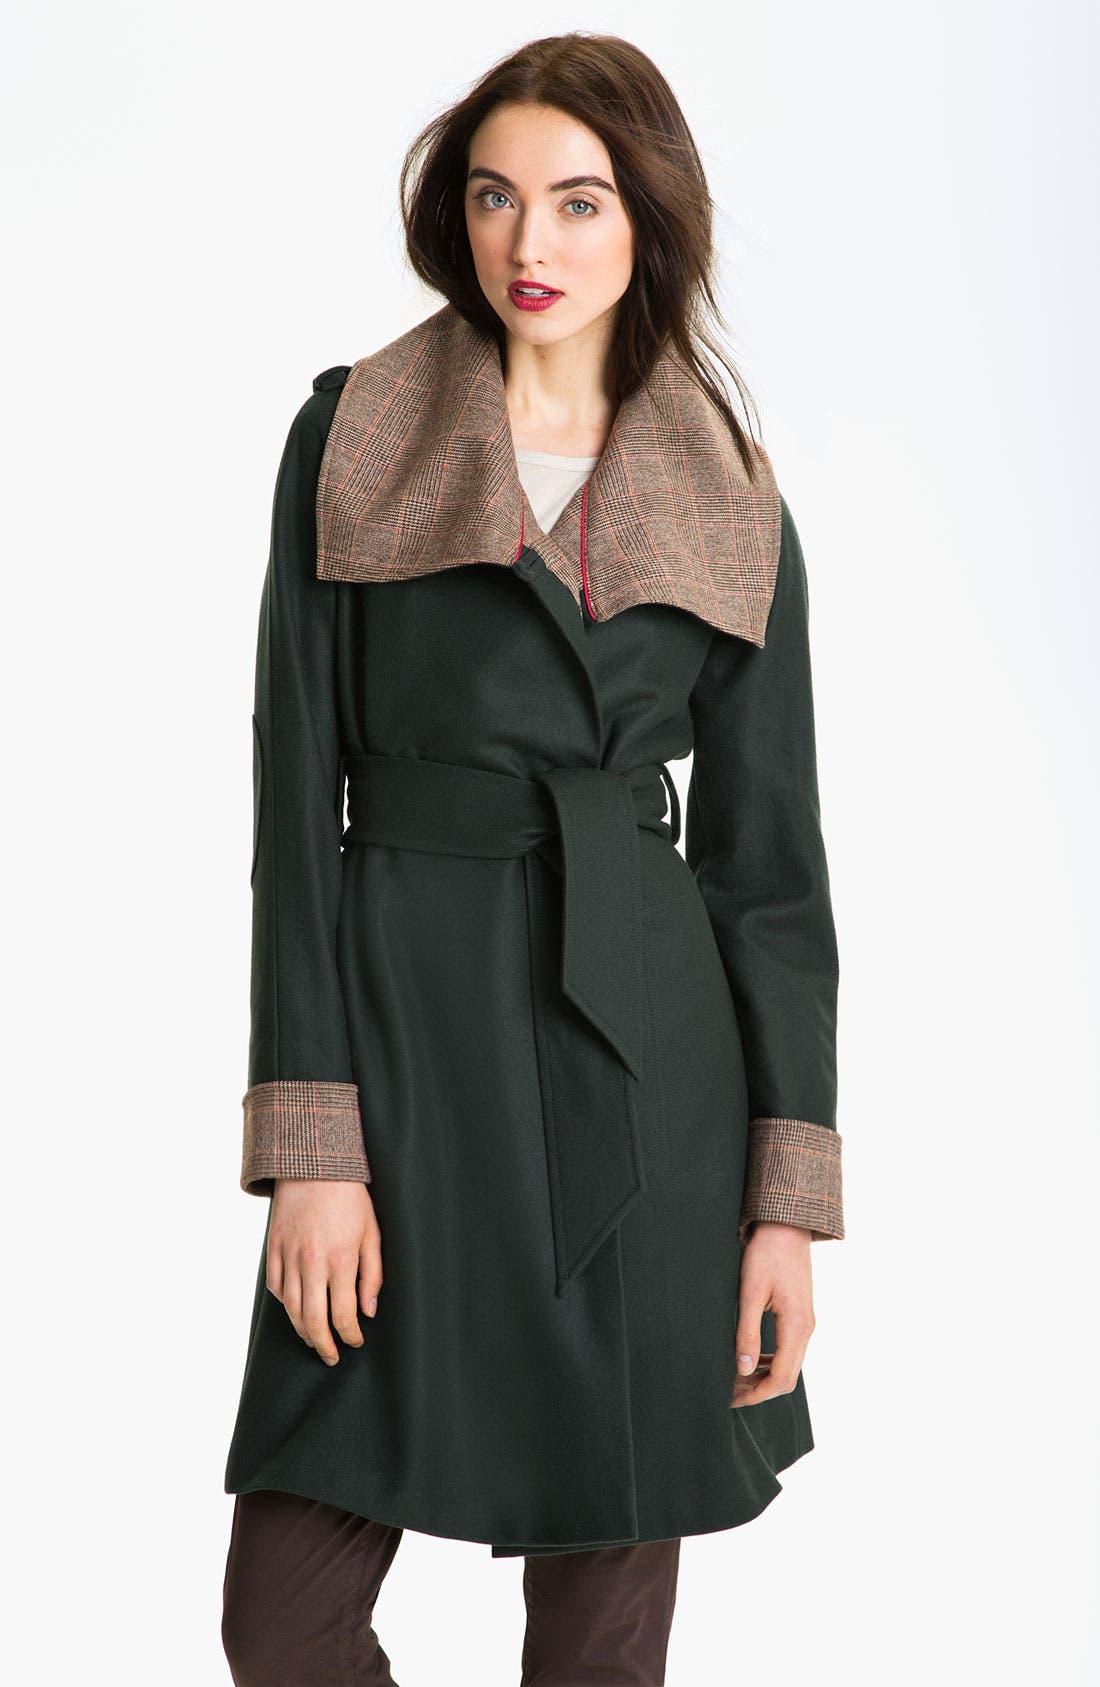 Alternate Image 1 Selected - Ted Baker London Plaid Trim Wrap Coat